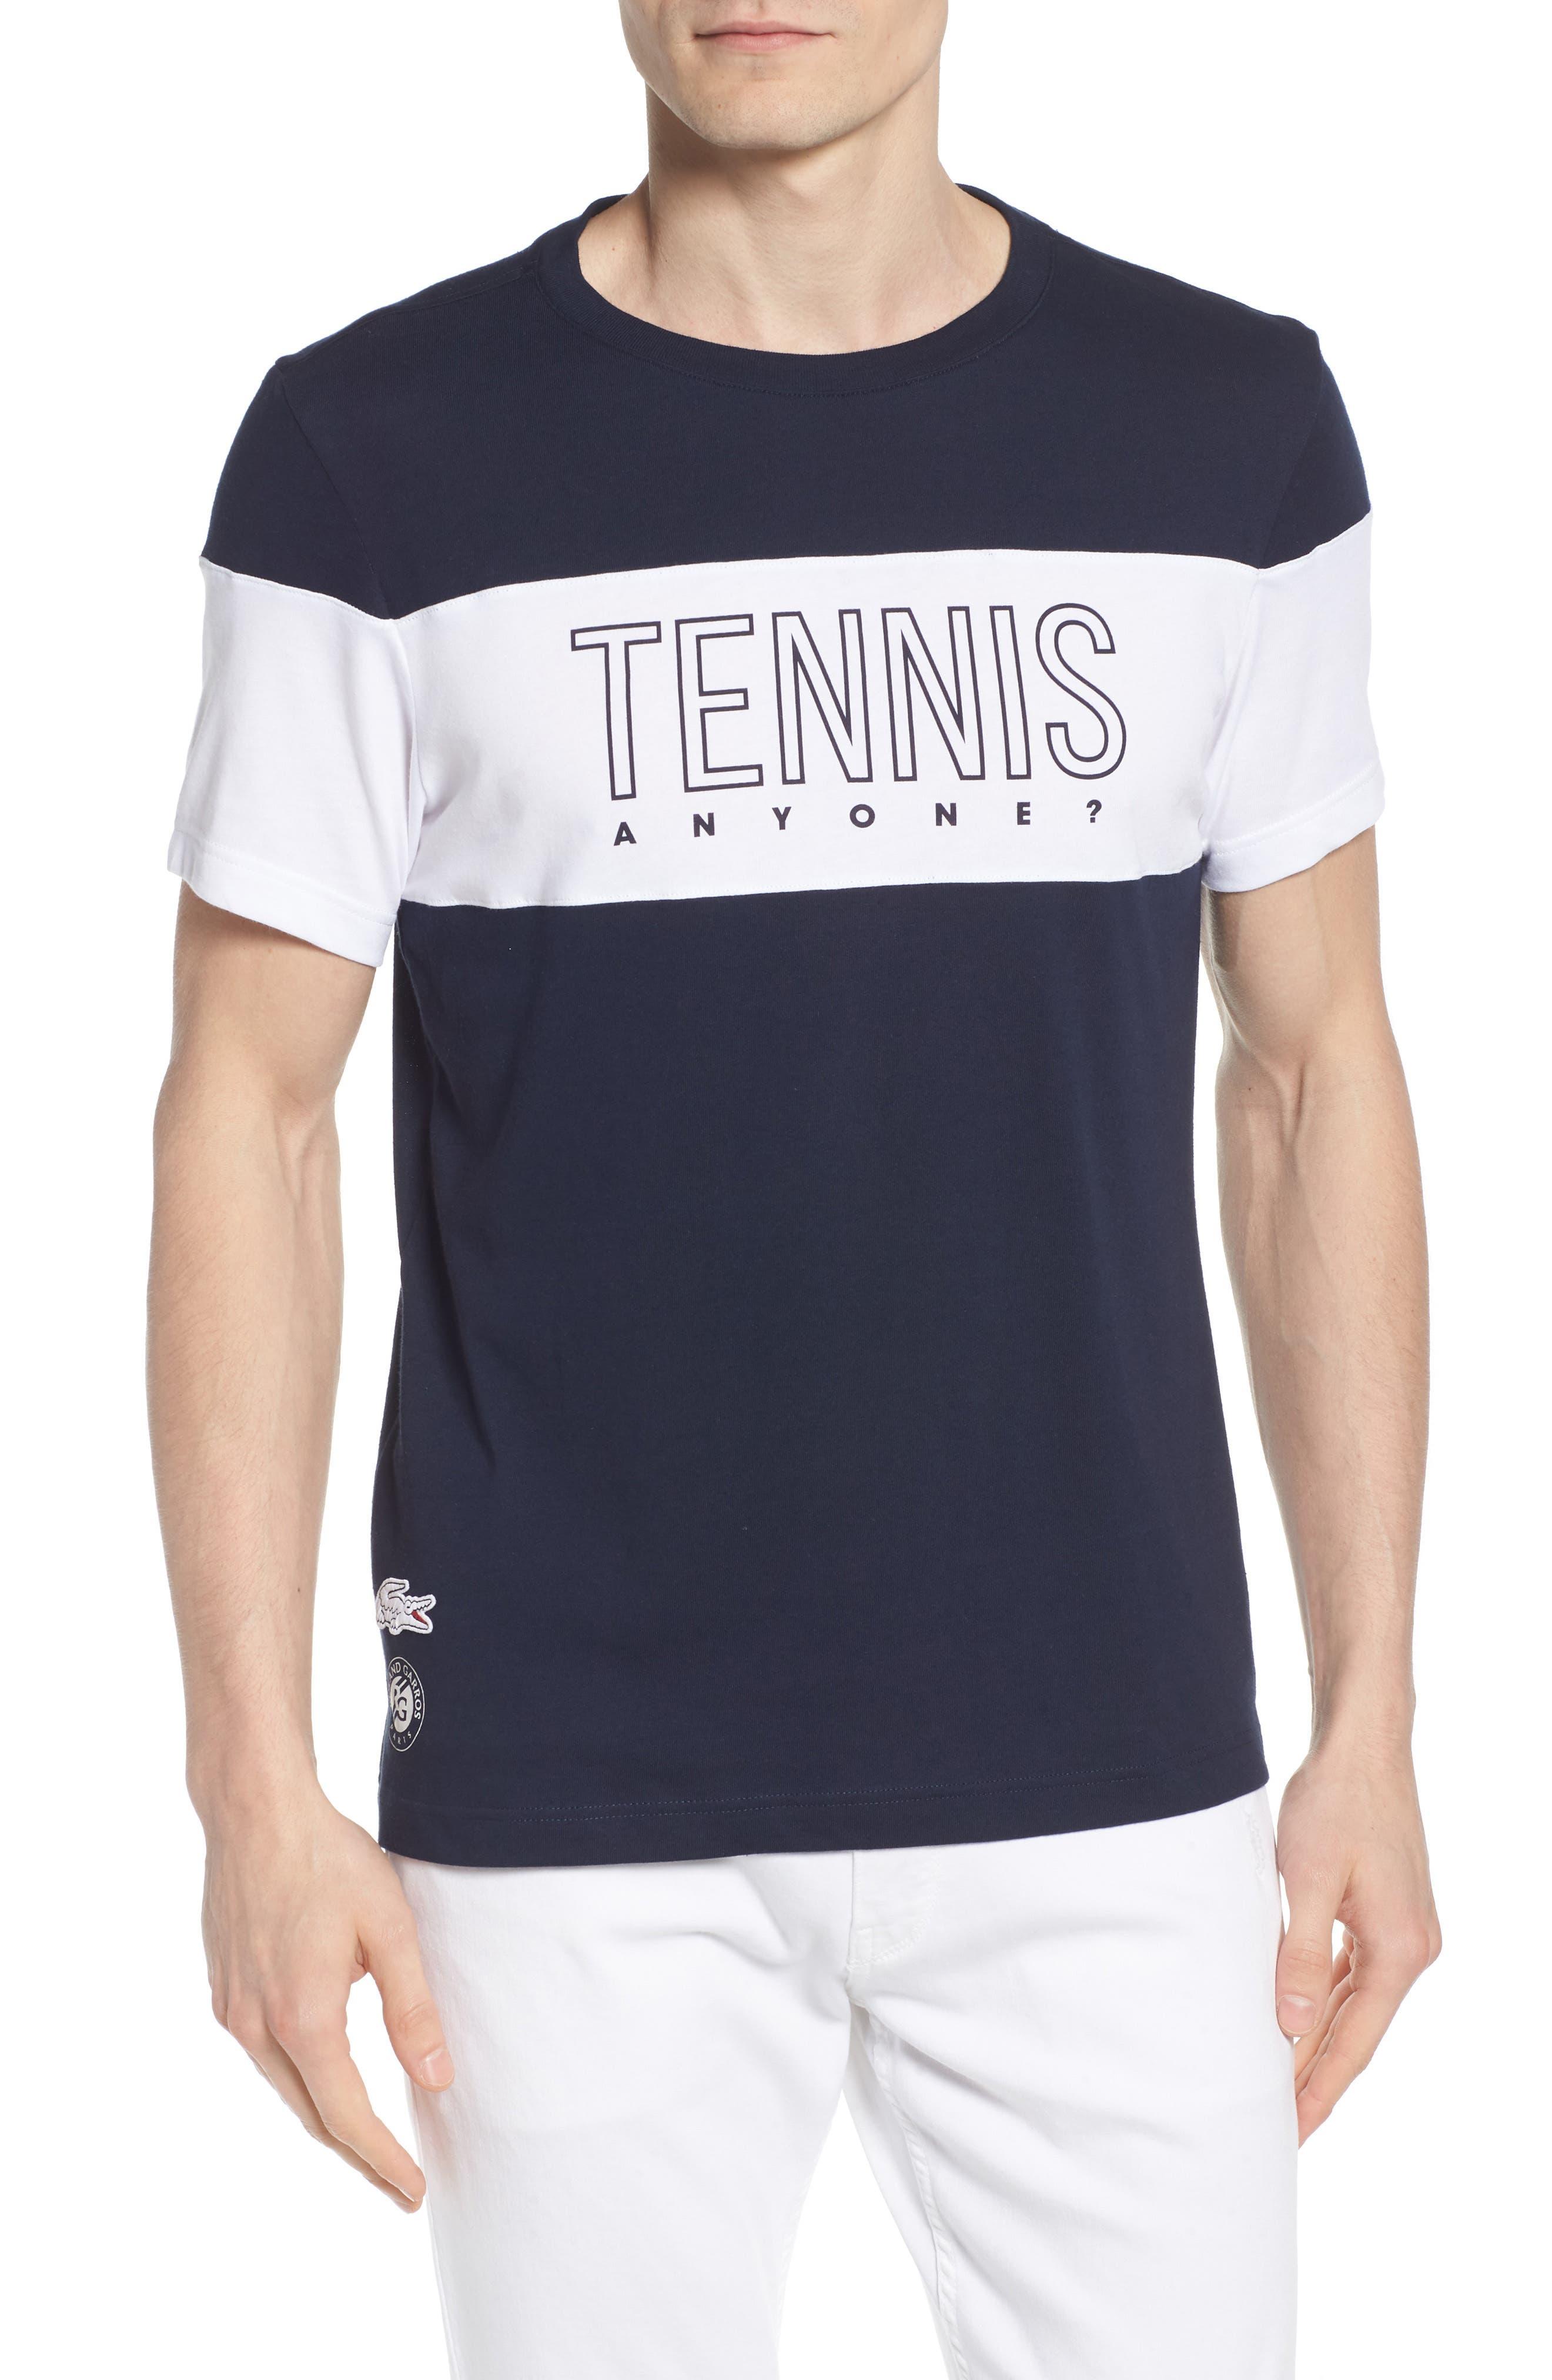 Tennis Anyone Tech Jersey T-Shirt,                         Main,                         color, Navy Blue/ White